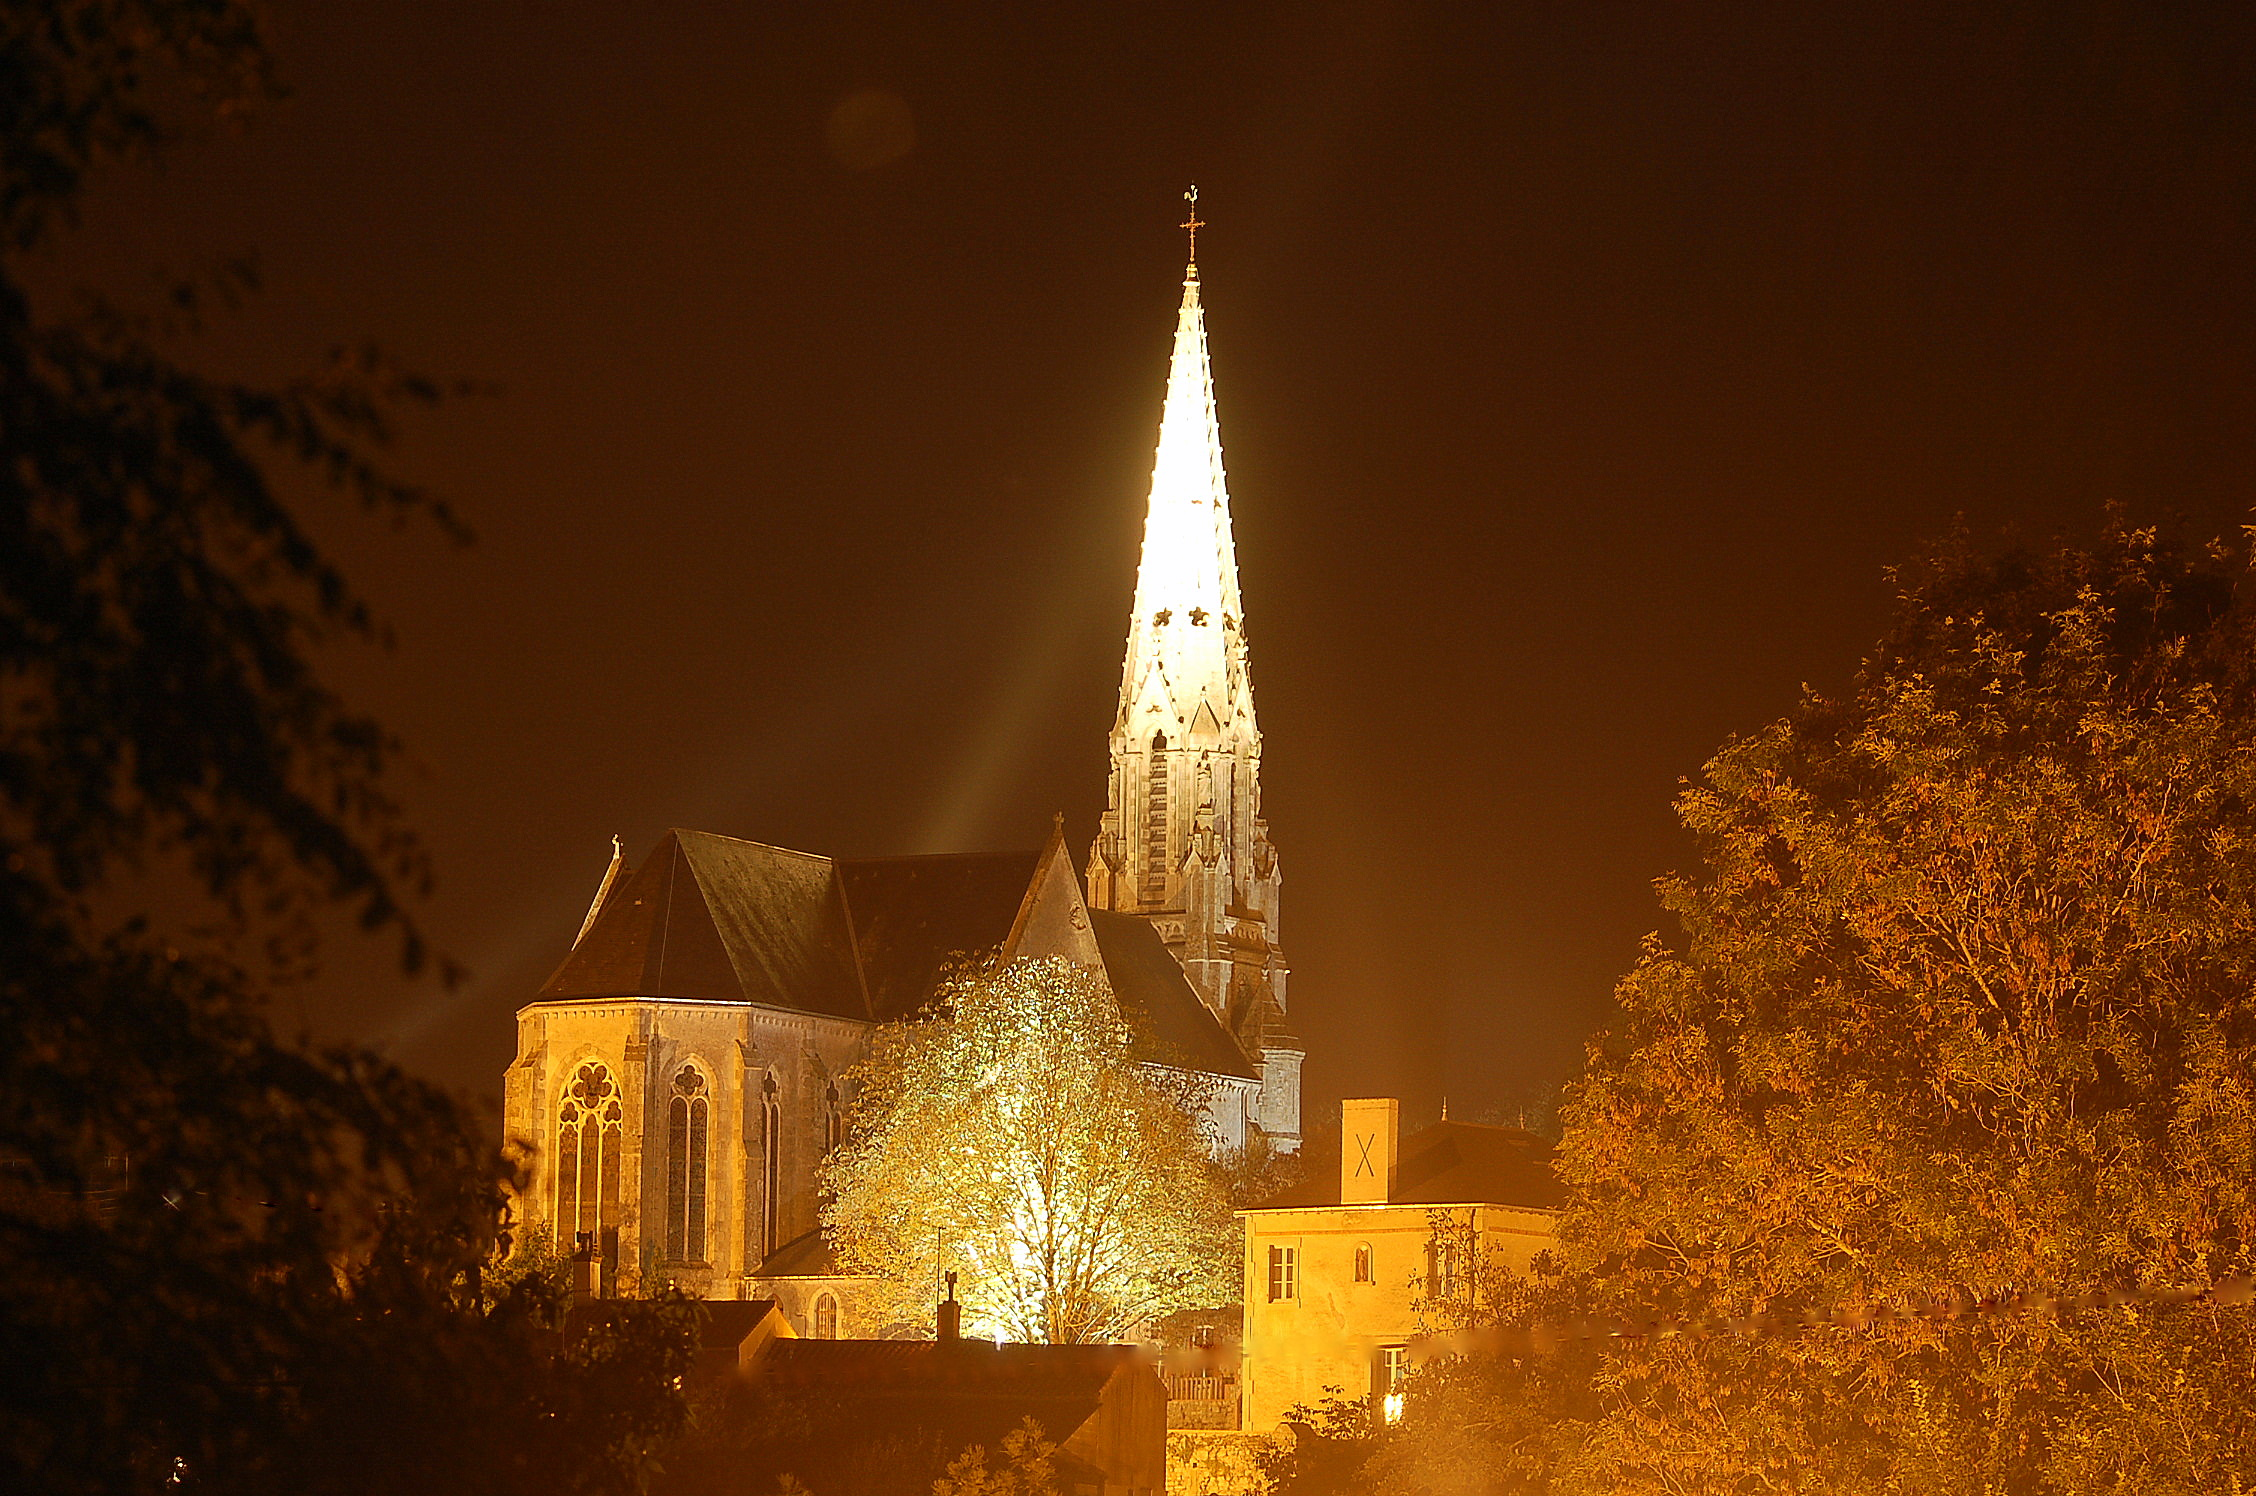 église nuit 1.JPG